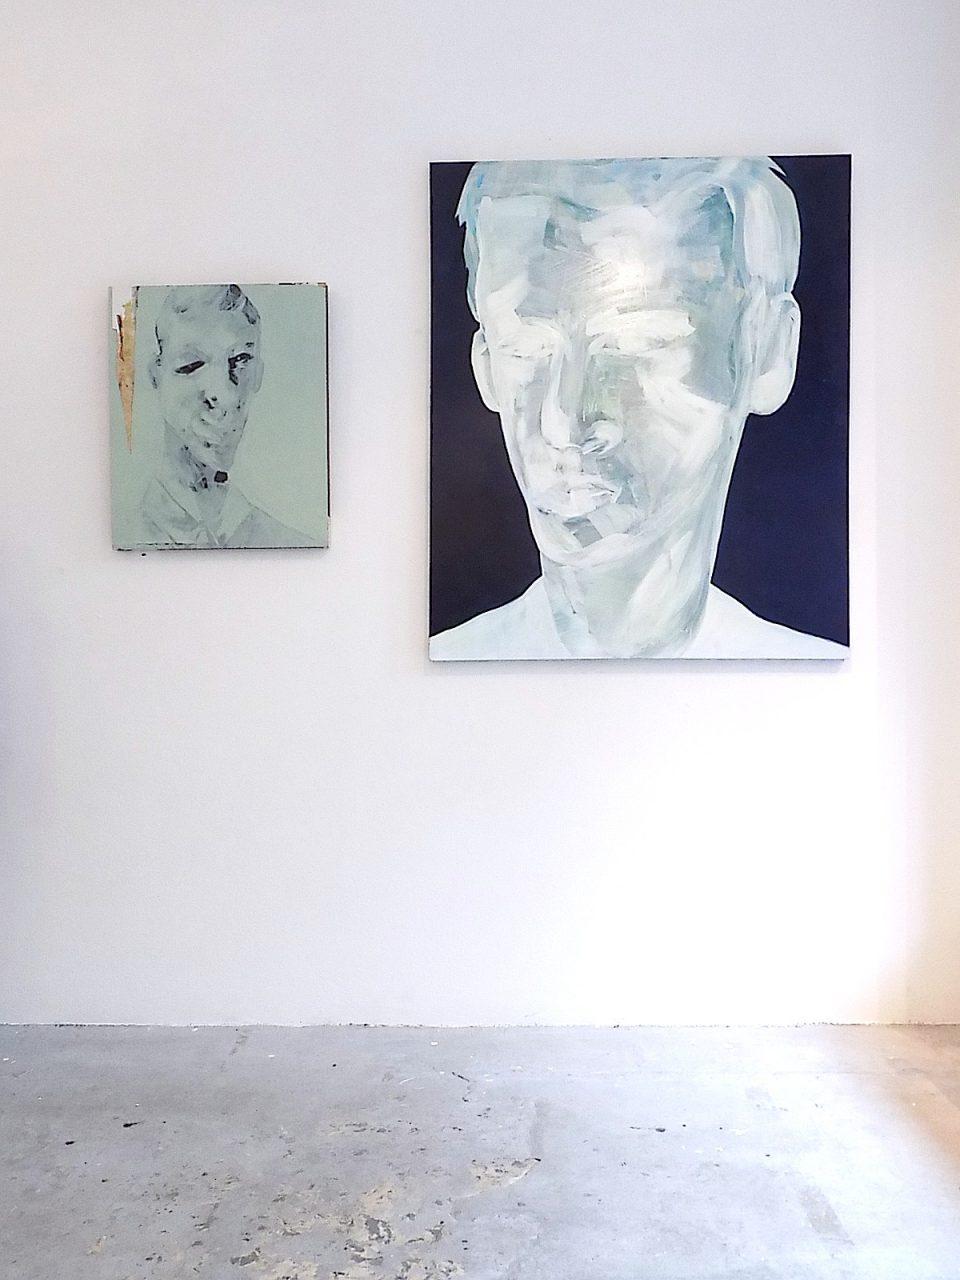 exhibition view UMӔTTELIGHED_VORACITY, BLAA GALLERI, Kopenhagen